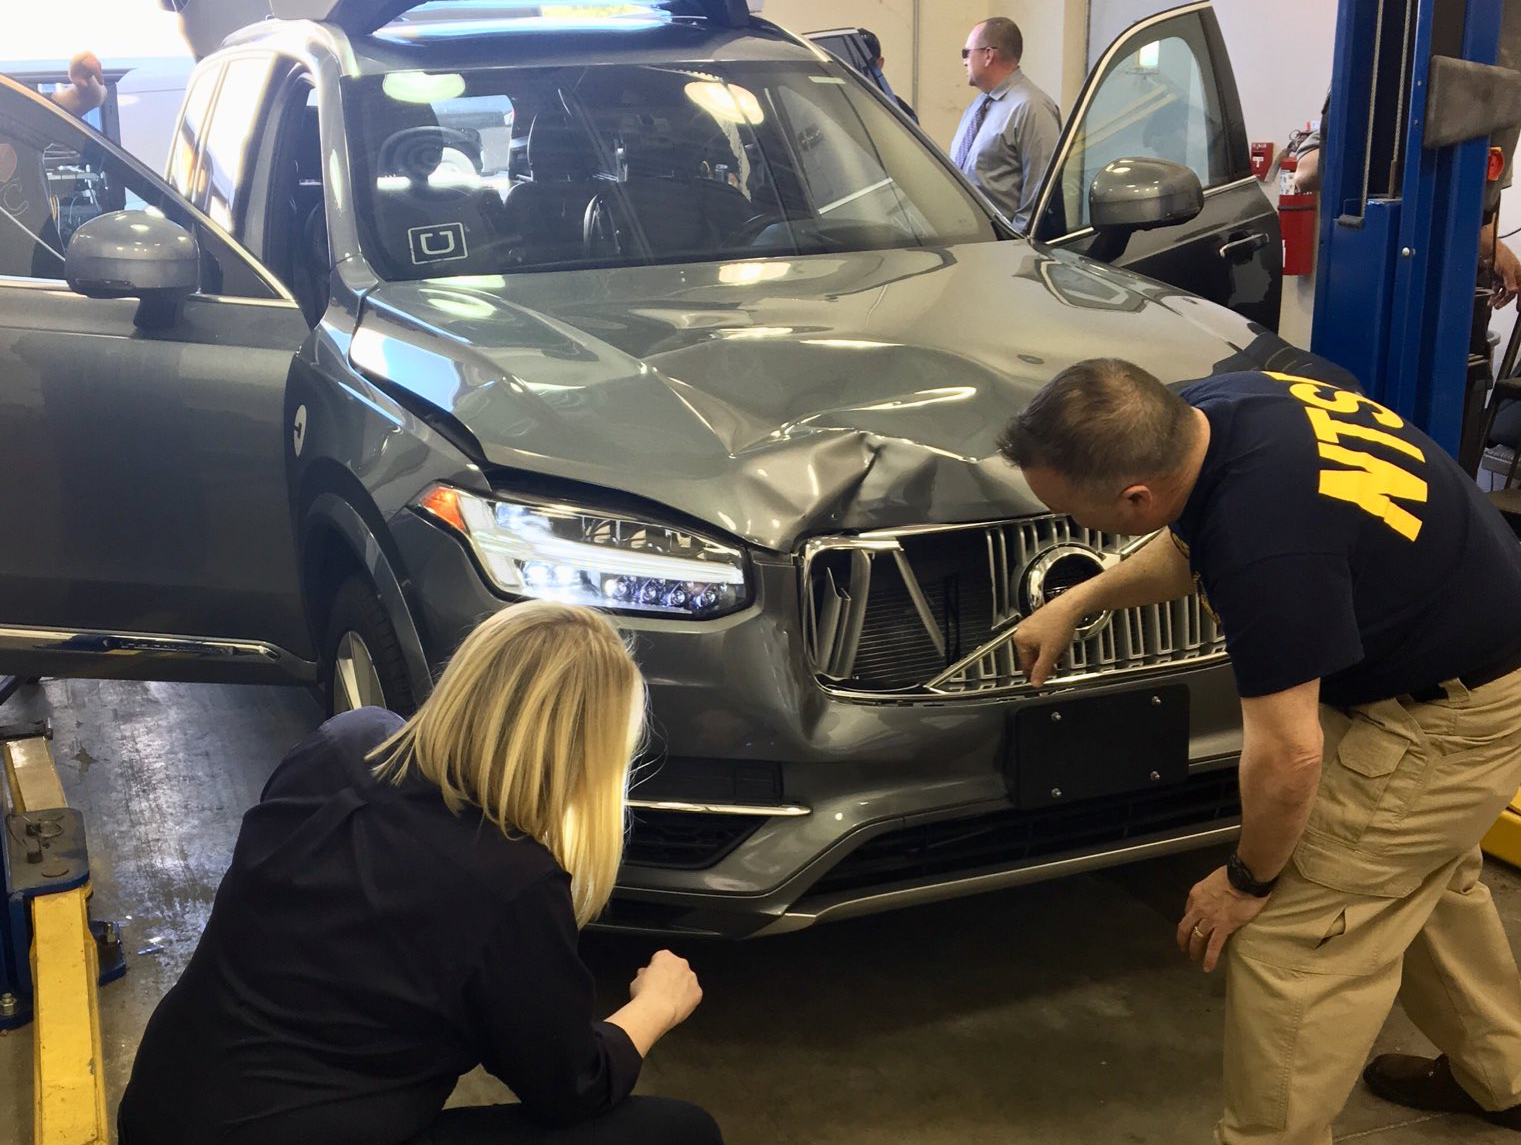 NTSB investigators inspect the self-driving Uber car that killed pedestrian Elaine Herzberg in March.